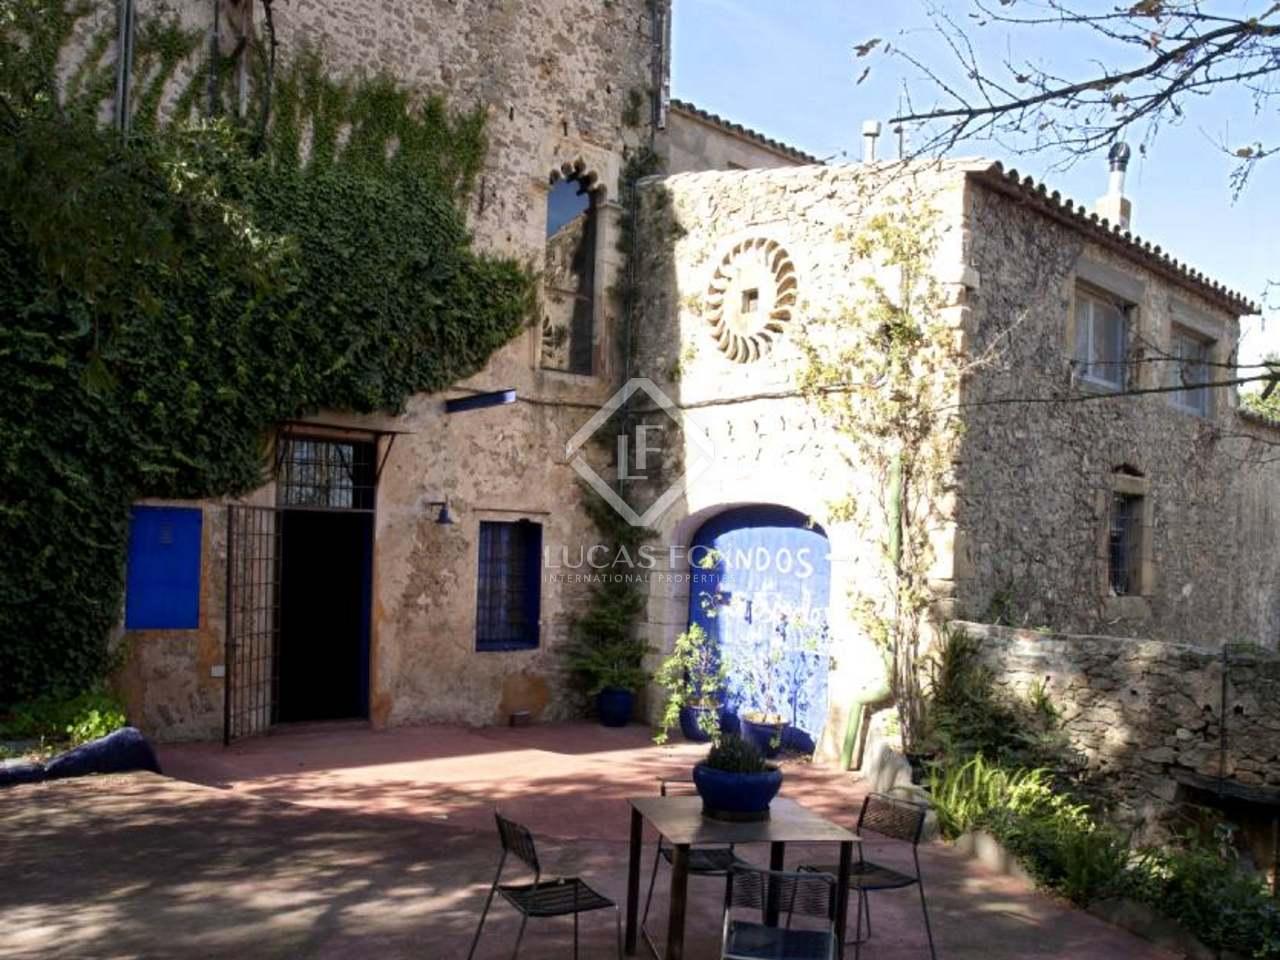 18th Century Castle to buy near the Costa Brava in Girona province